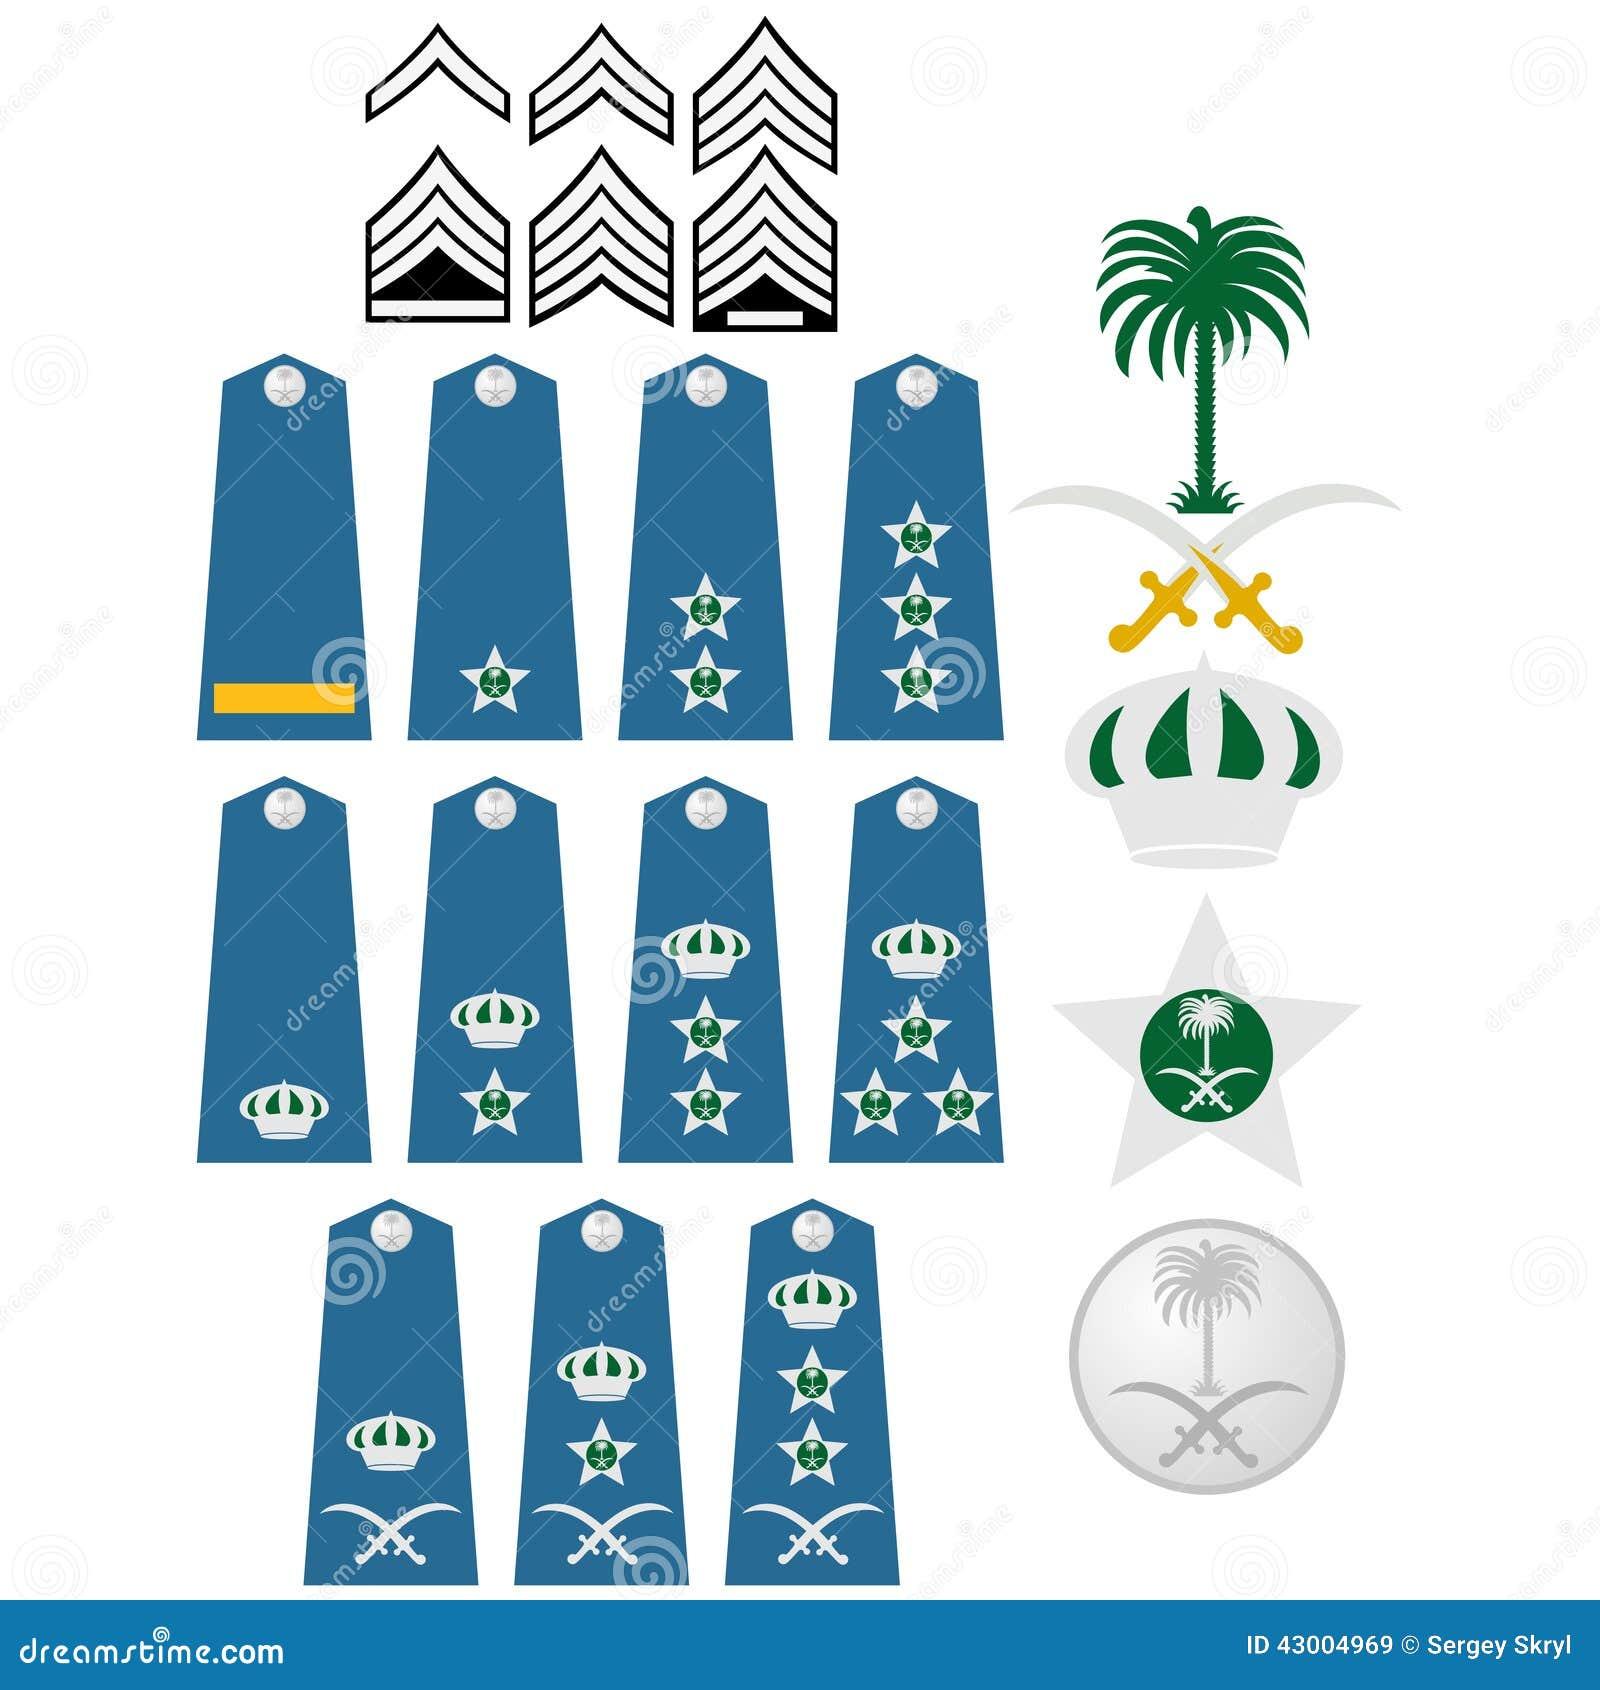 Air force insignia saudi arabia stock vector illustration of sign air force insignia saudi arabia biocorpaavc Images